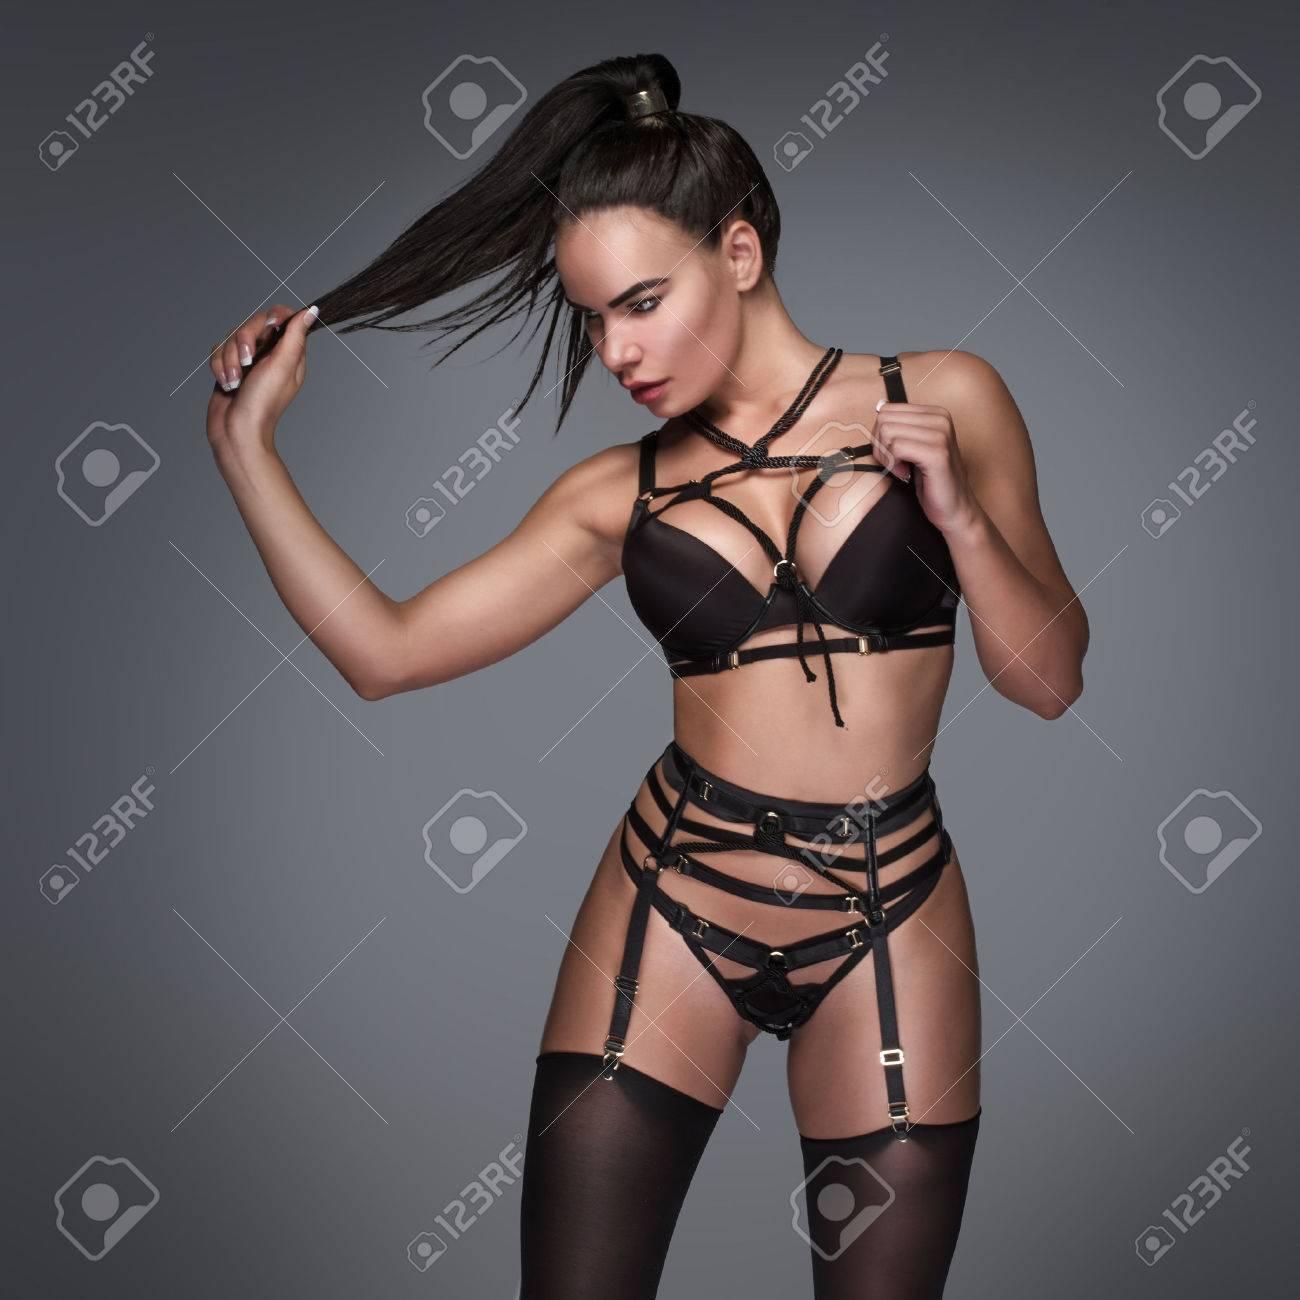 Female Bondage Lingerie